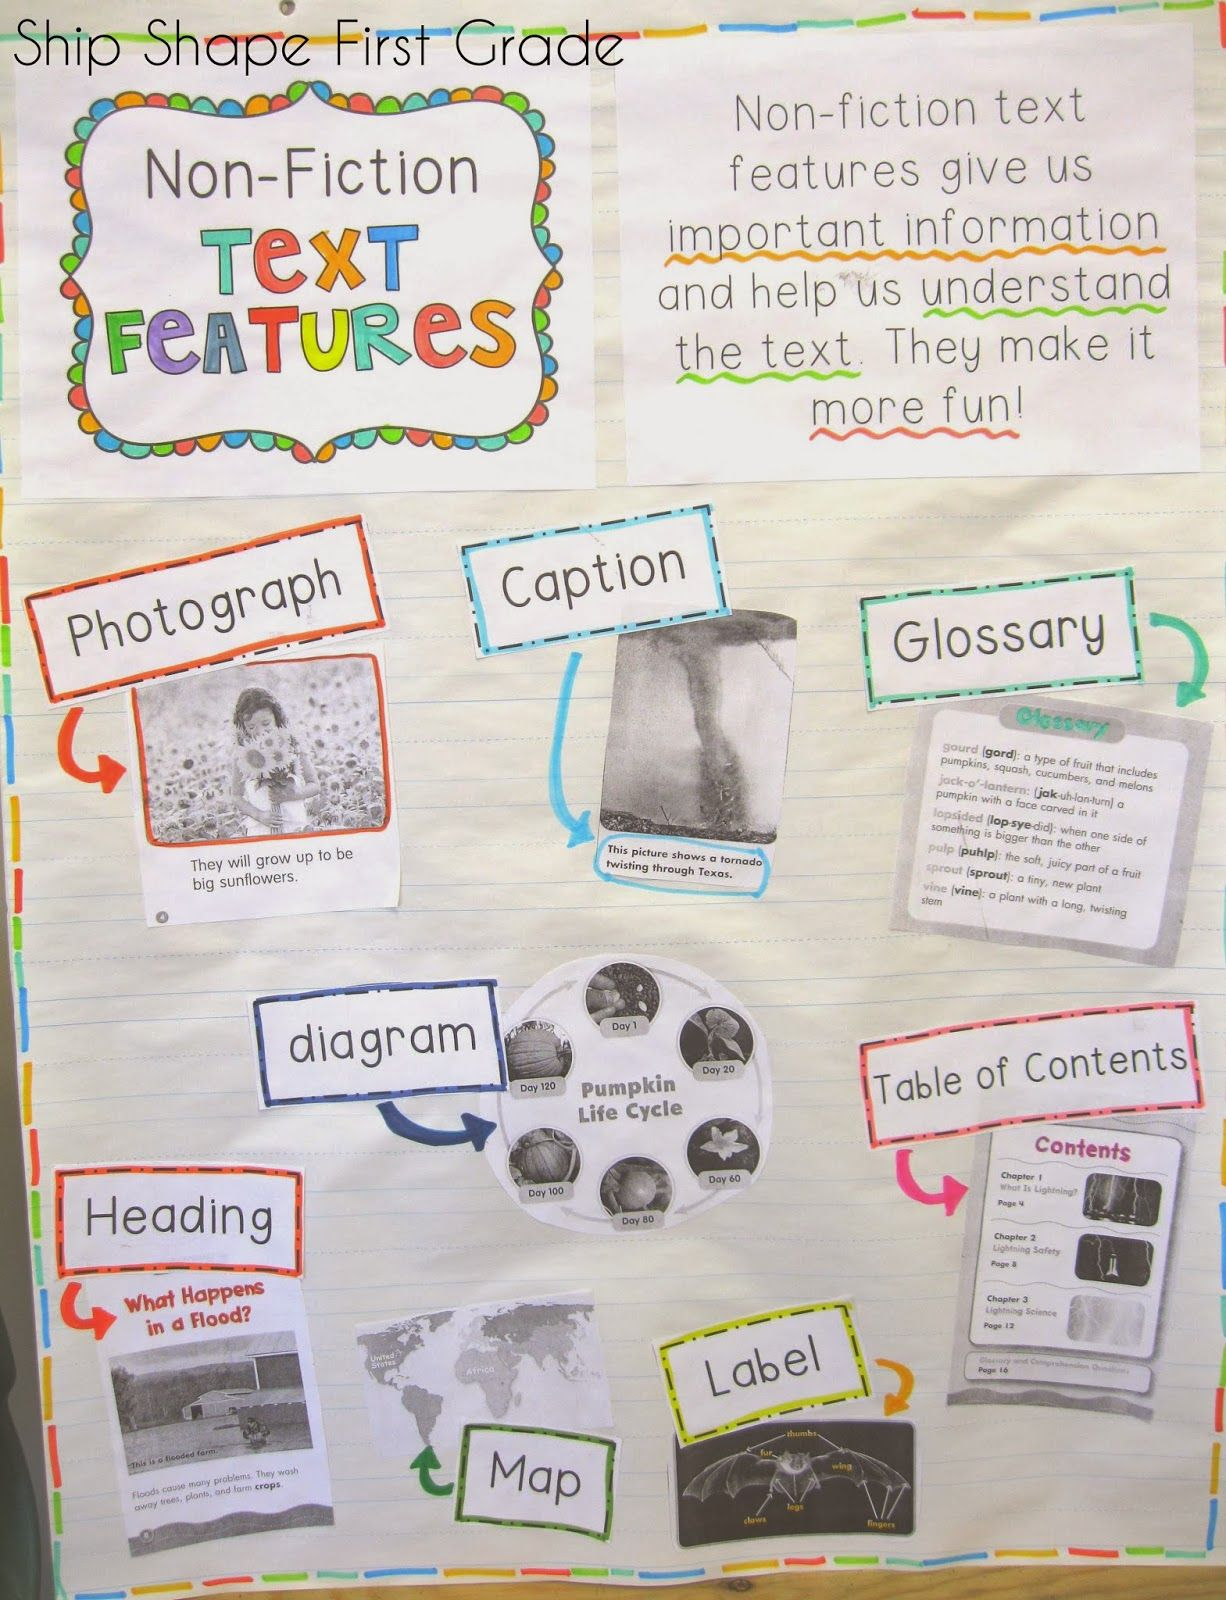 Non Fiction Text Features Ship Shape First Grade Five